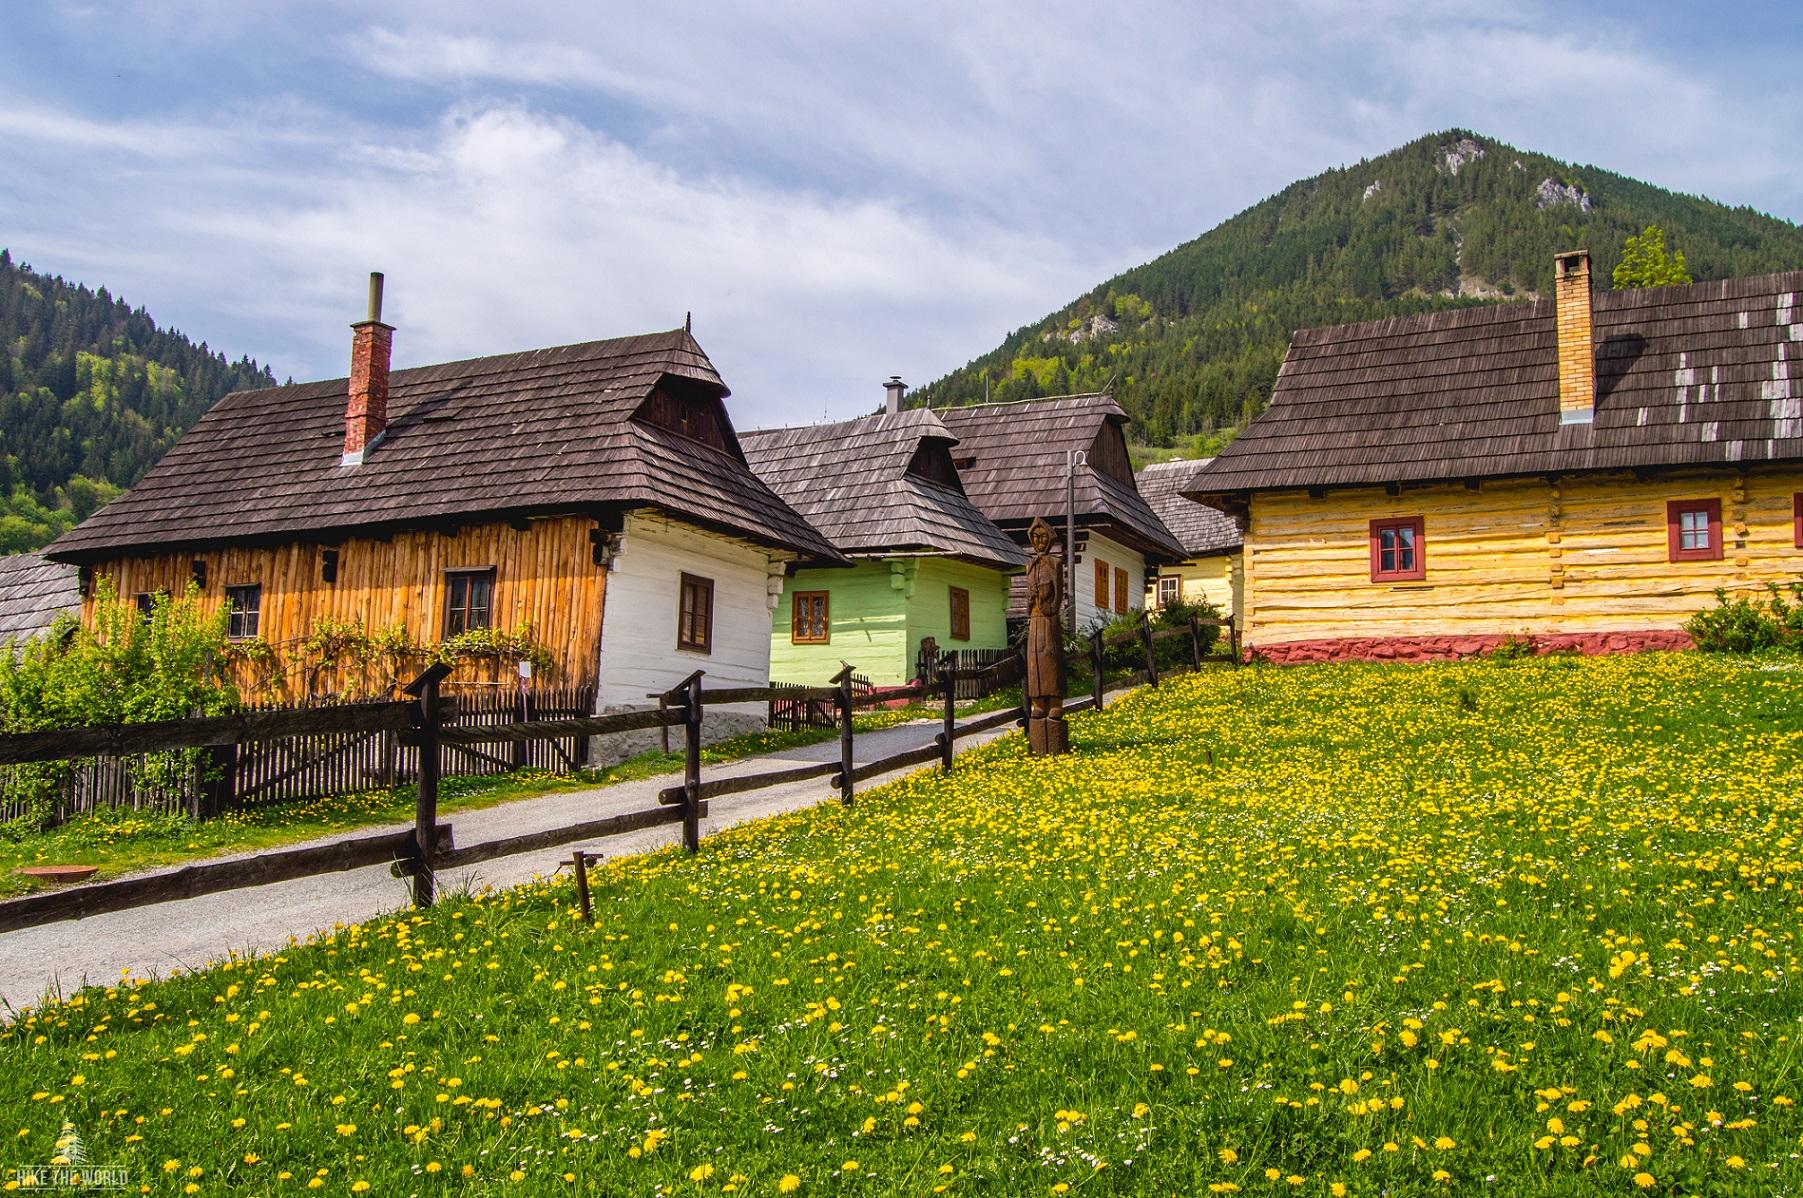 Slovensko, to je náš pravý domov